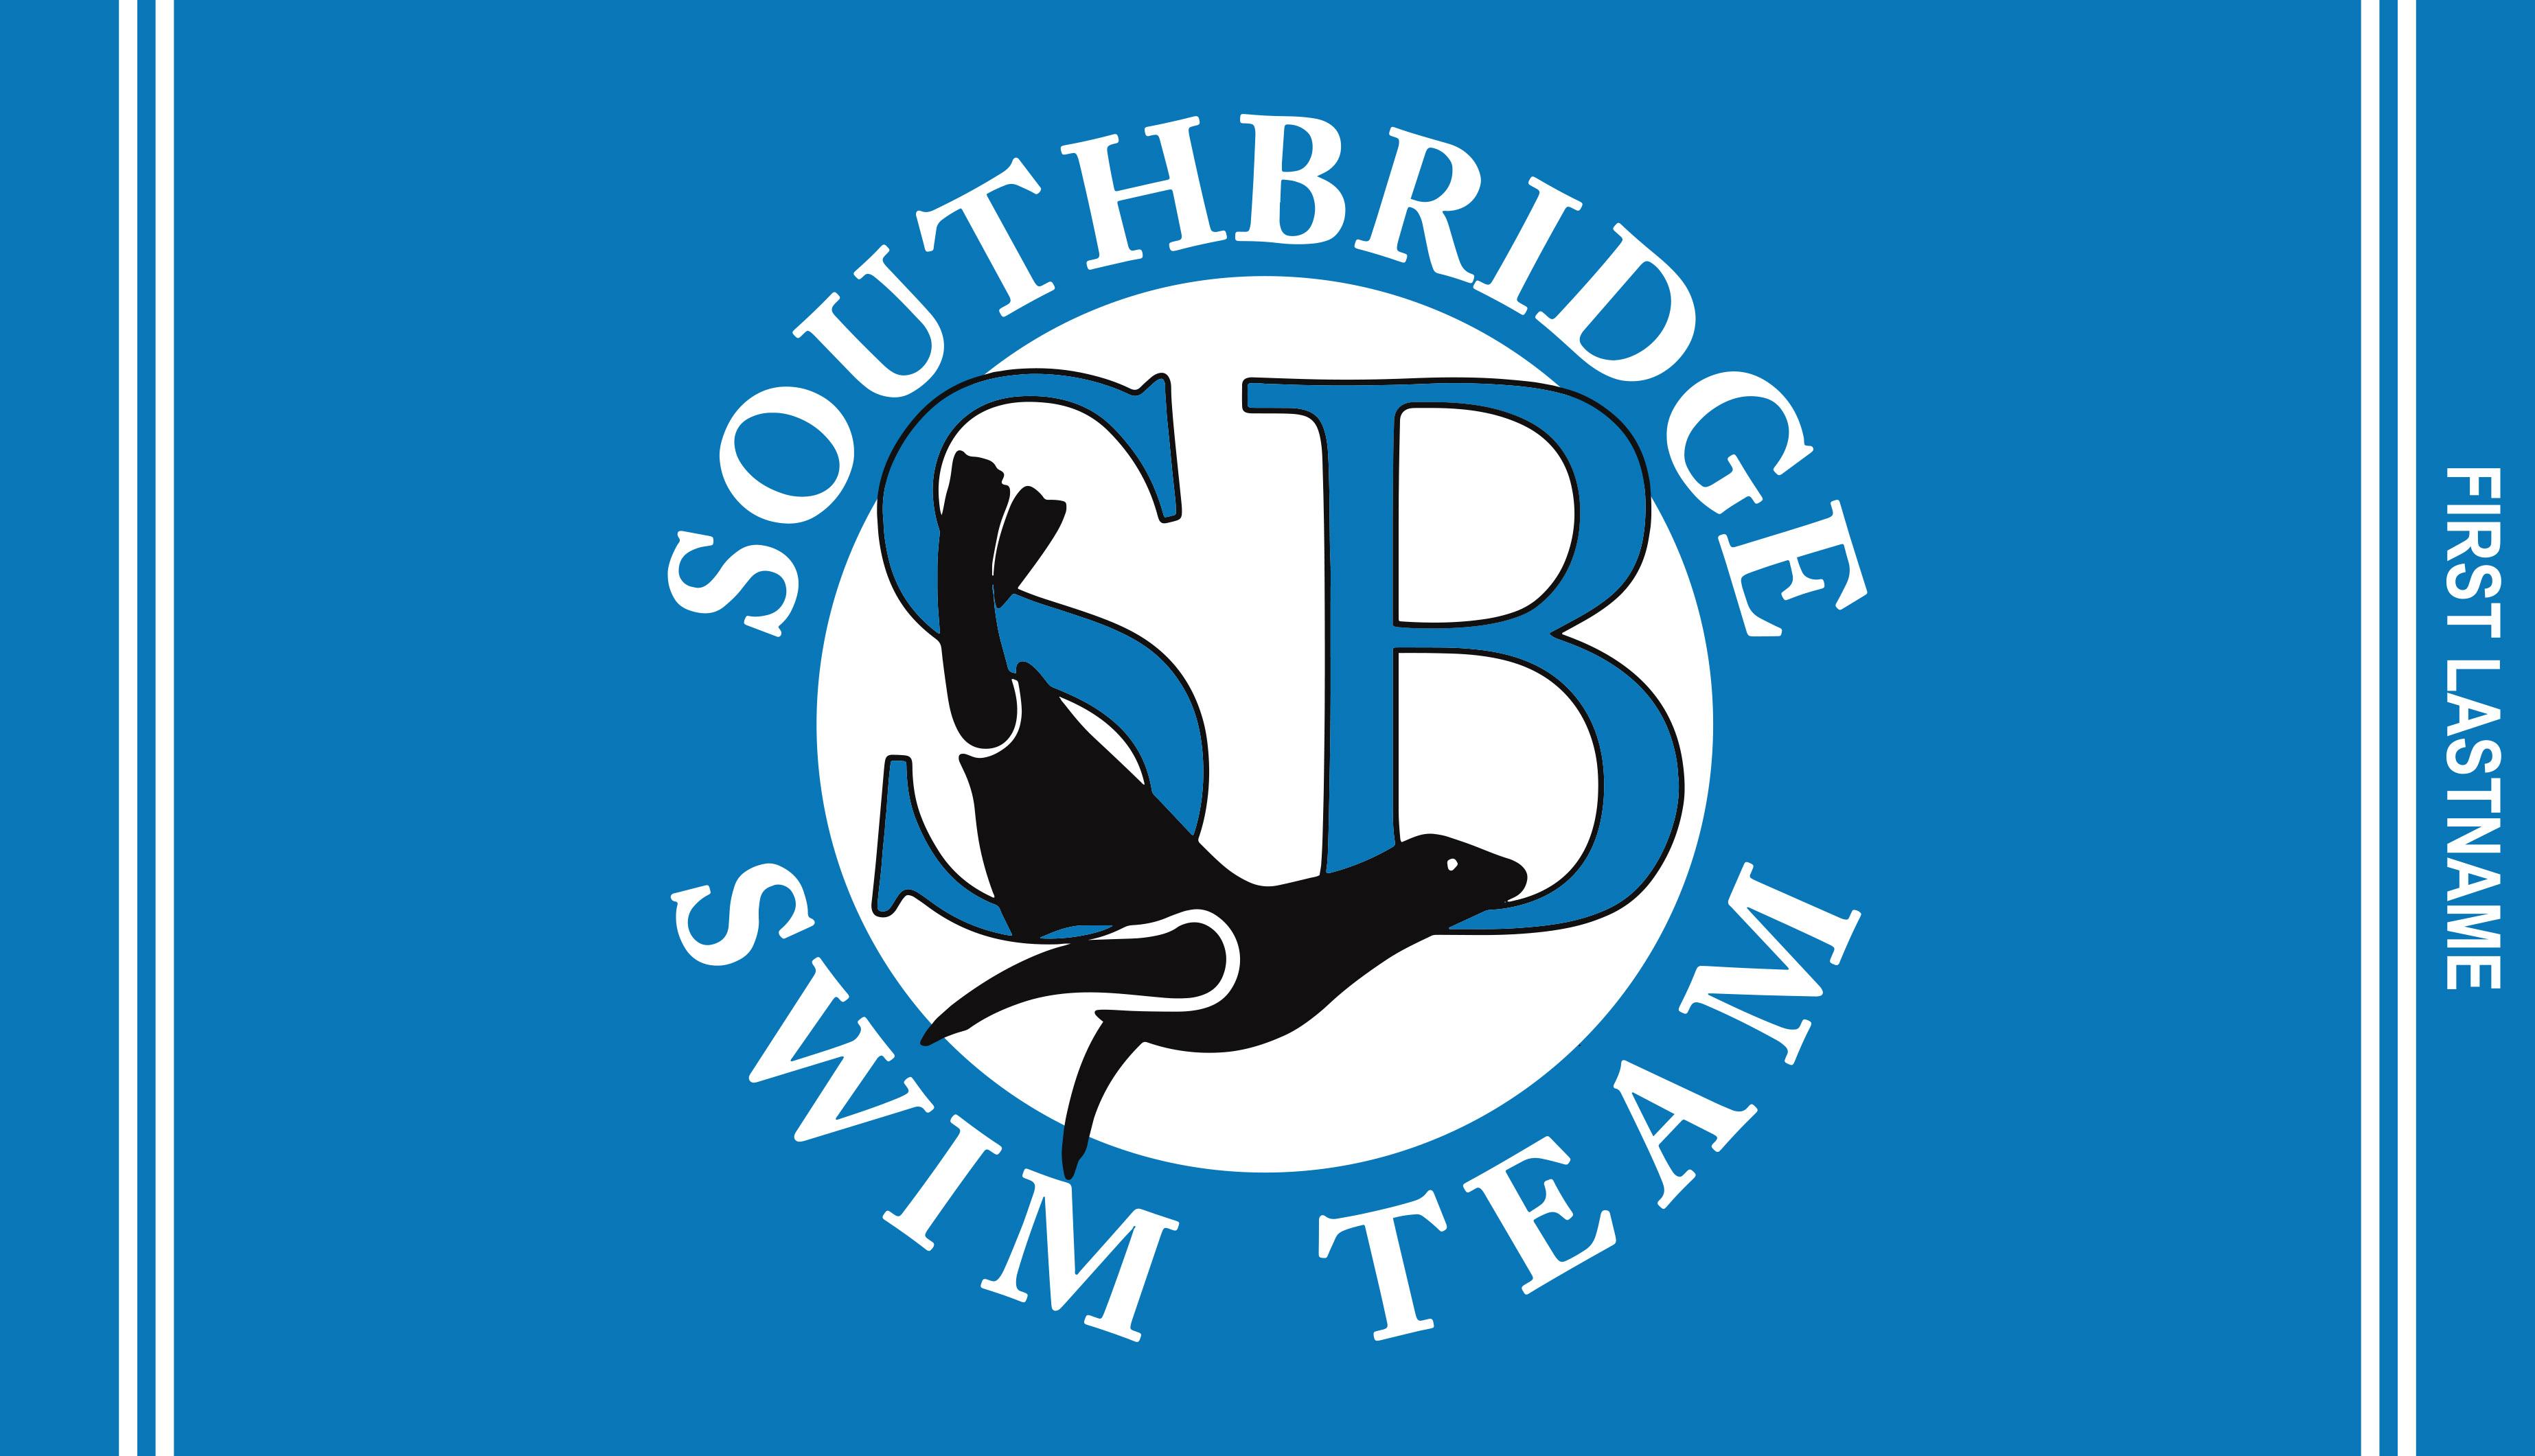 00420-SouthBridgeSwimTeam-34x60_V2